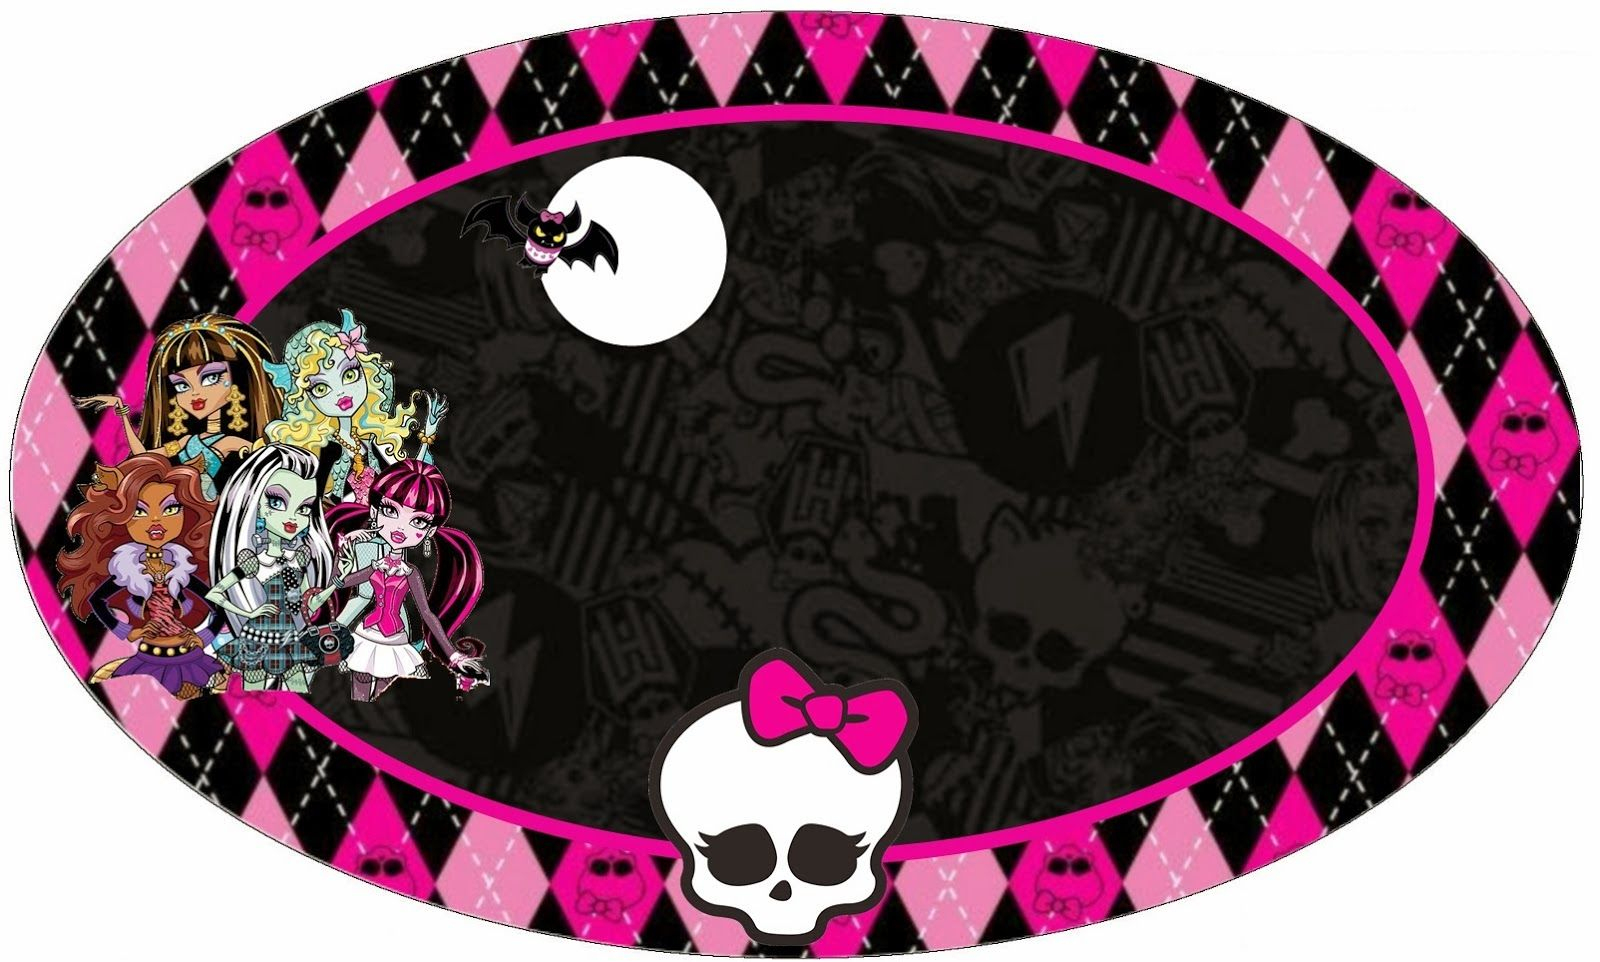 Monster High Printable Templates | Free Printable Toppers Stickers - Free Printable Monster High Stickers